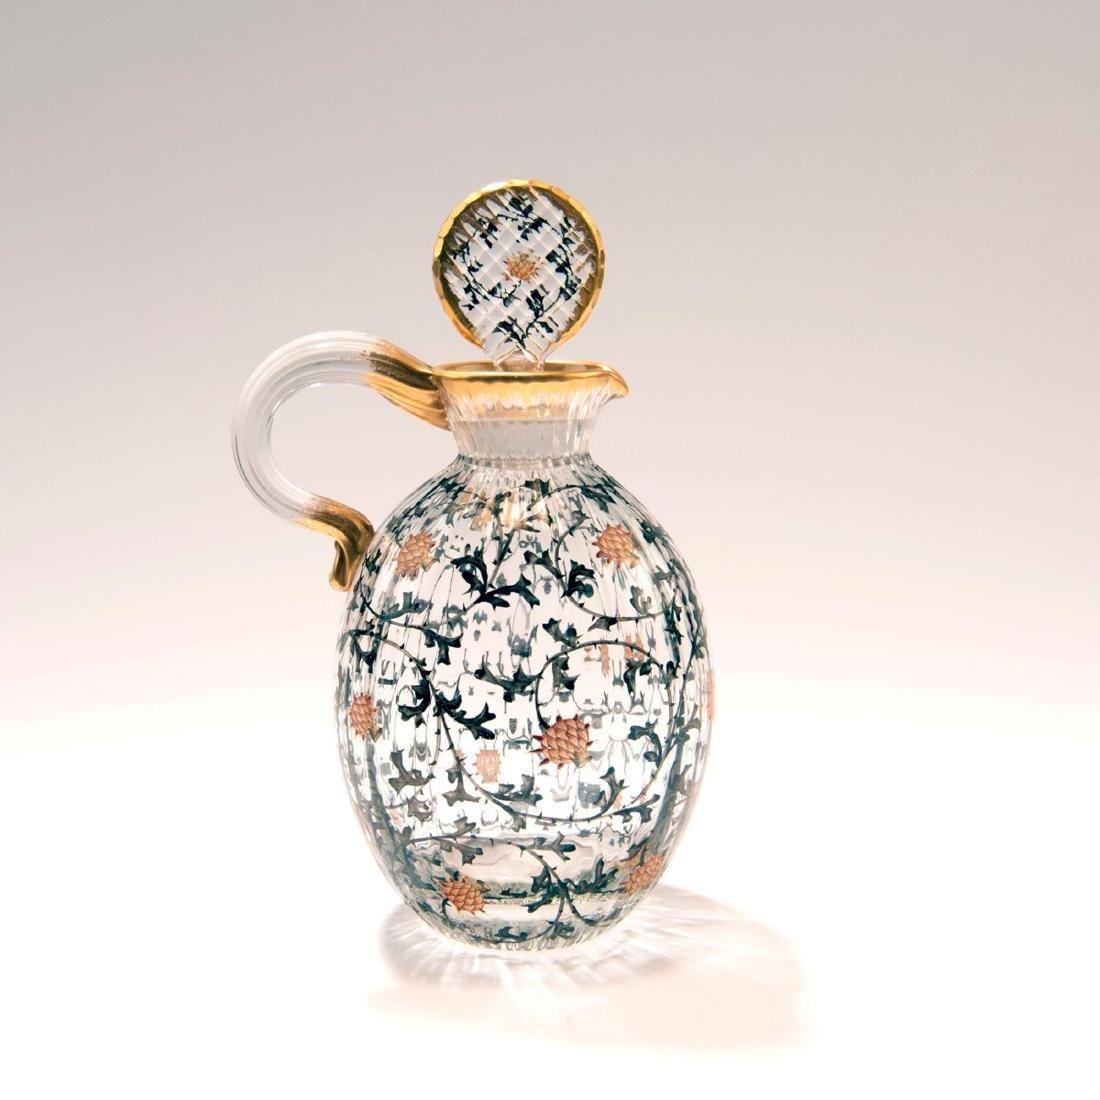 Small 'Chardons' jug, c. 1892 - 2